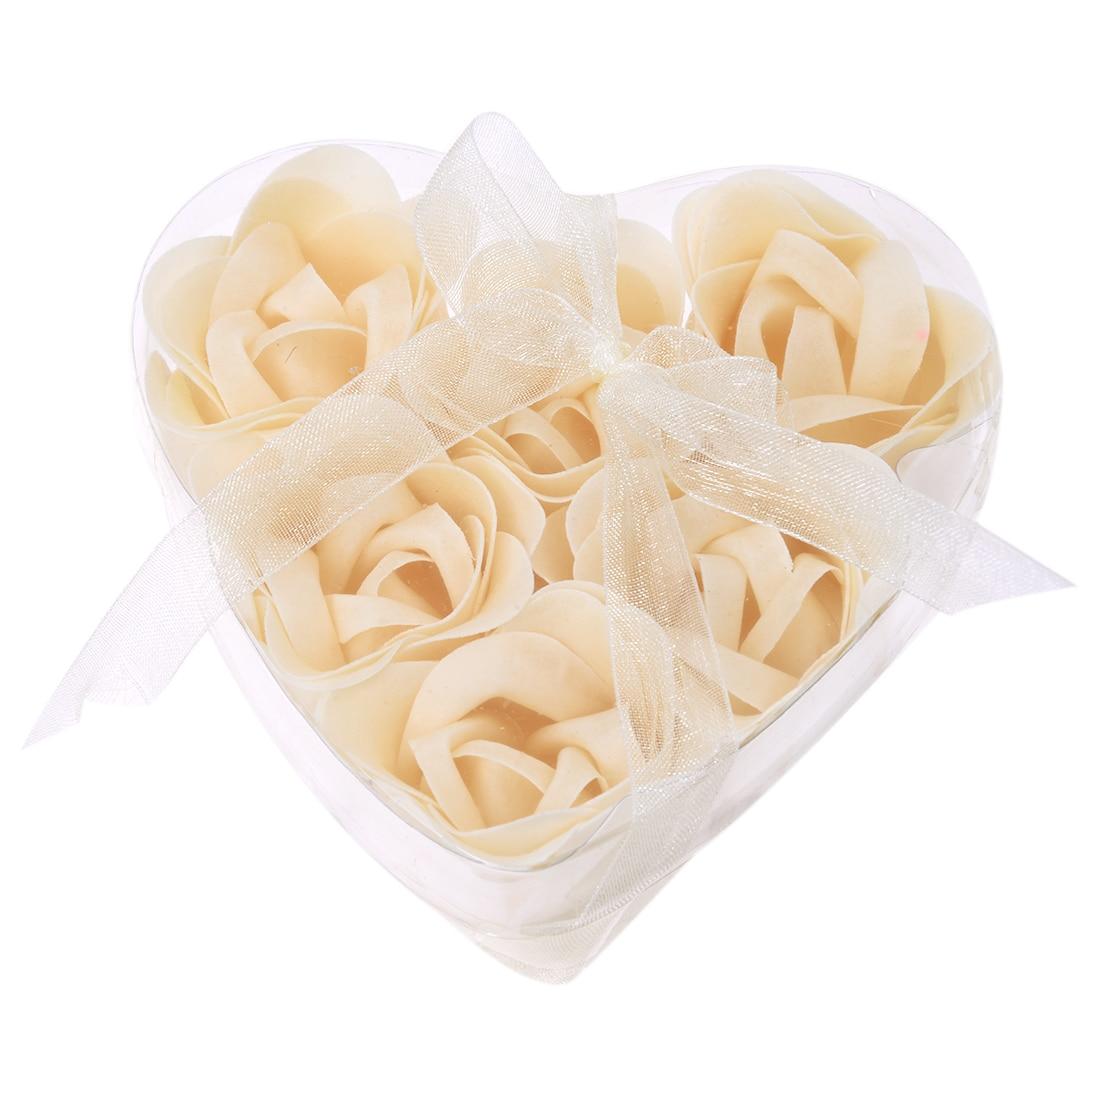 6 Pcs Bathing Shower Off White Rose Flower Bath Soap Petals W Heart Shaped Box